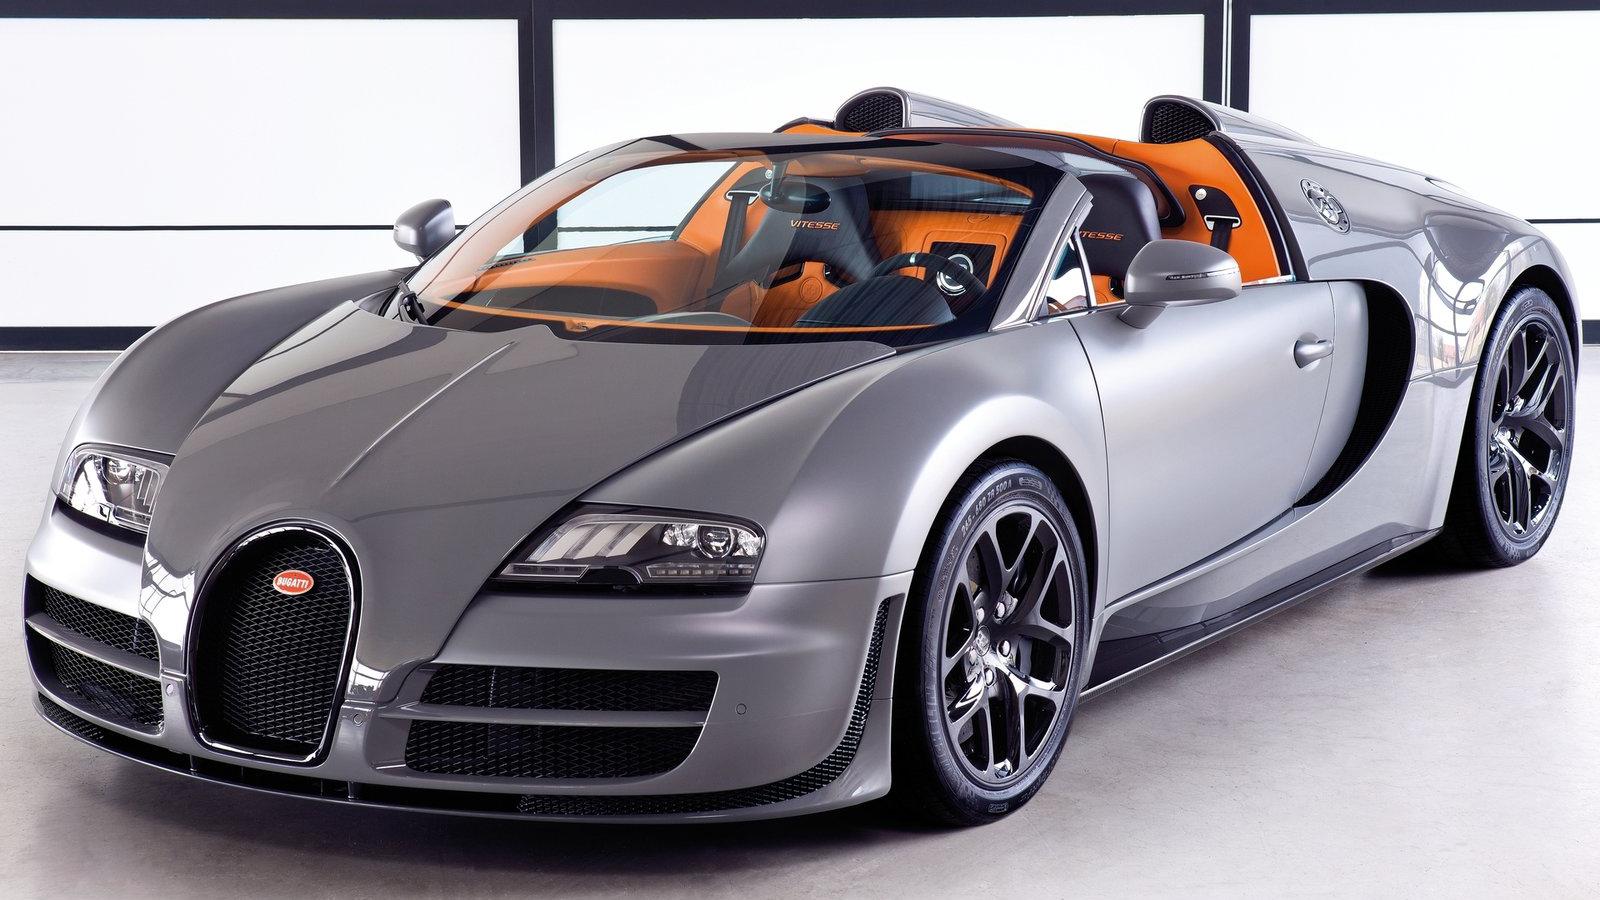 2012 bugatti veyron grand sport vitesse 8 0 w16 quad turbo 1200 cv 153 mkgf 416 kmh 0 100 kmh 2. Black Bedroom Furniture Sets. Home Design Ideas